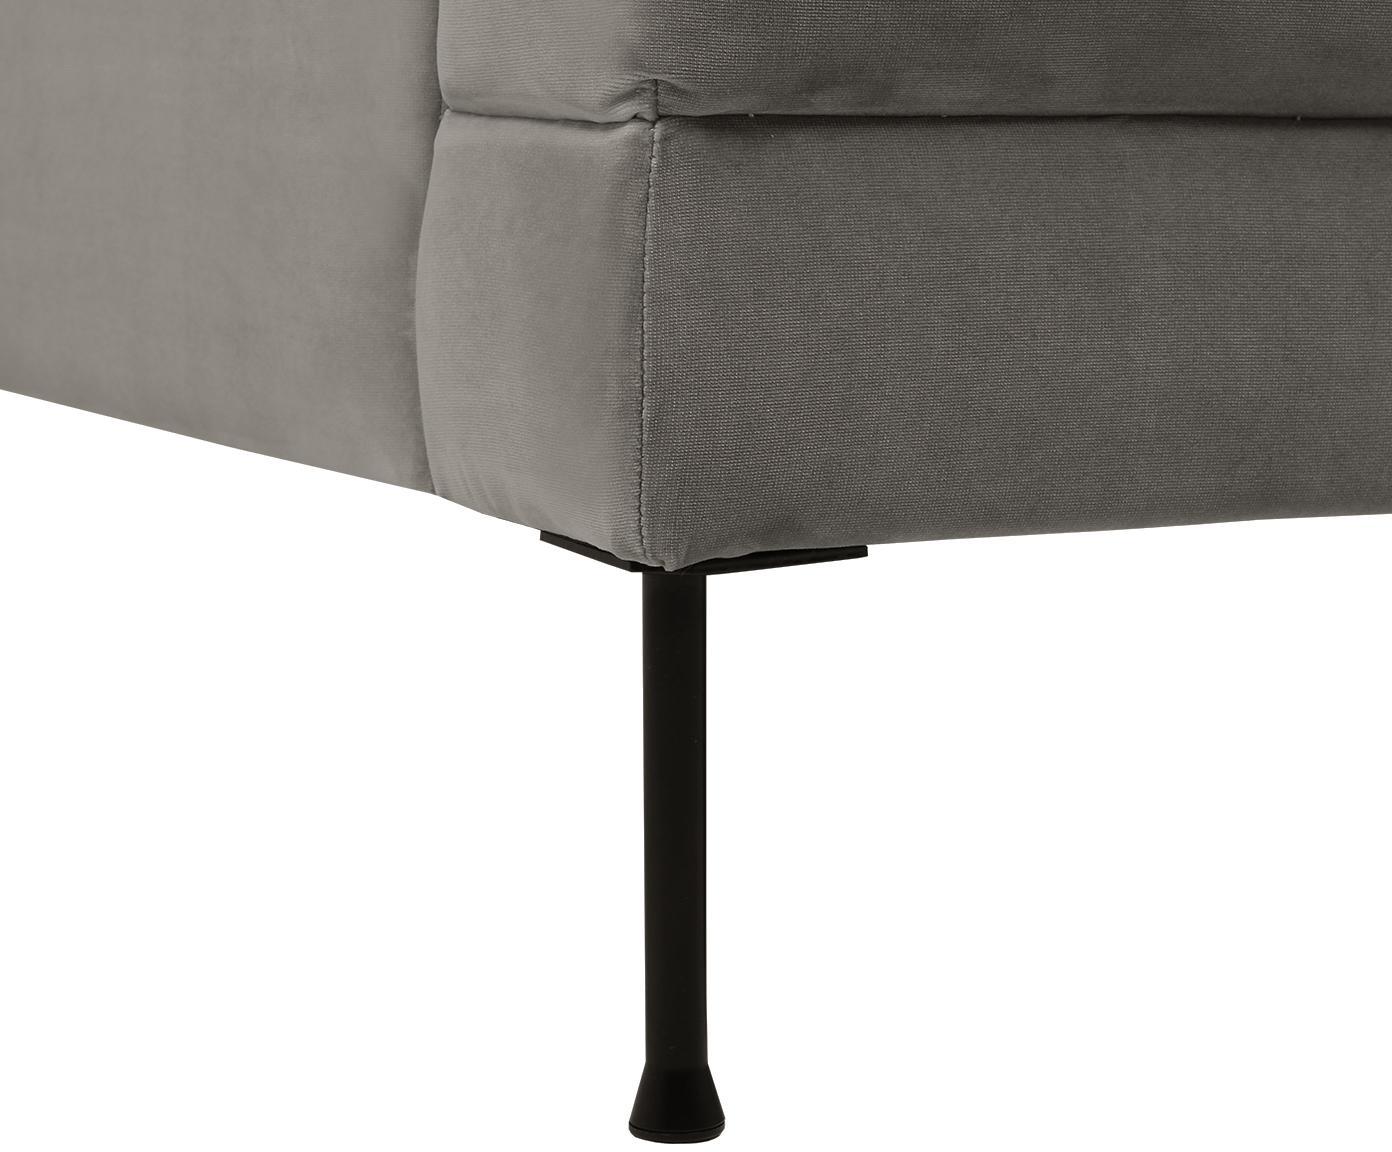 Samt-Sofa Fluente (3-Sitzer), Bezug: Samt (Hochwertiger Polyes, Gestell: Massives Kiefernholz, Füße: Metall, lackiert, Samt Braungrau, B 197 x T 83 cm